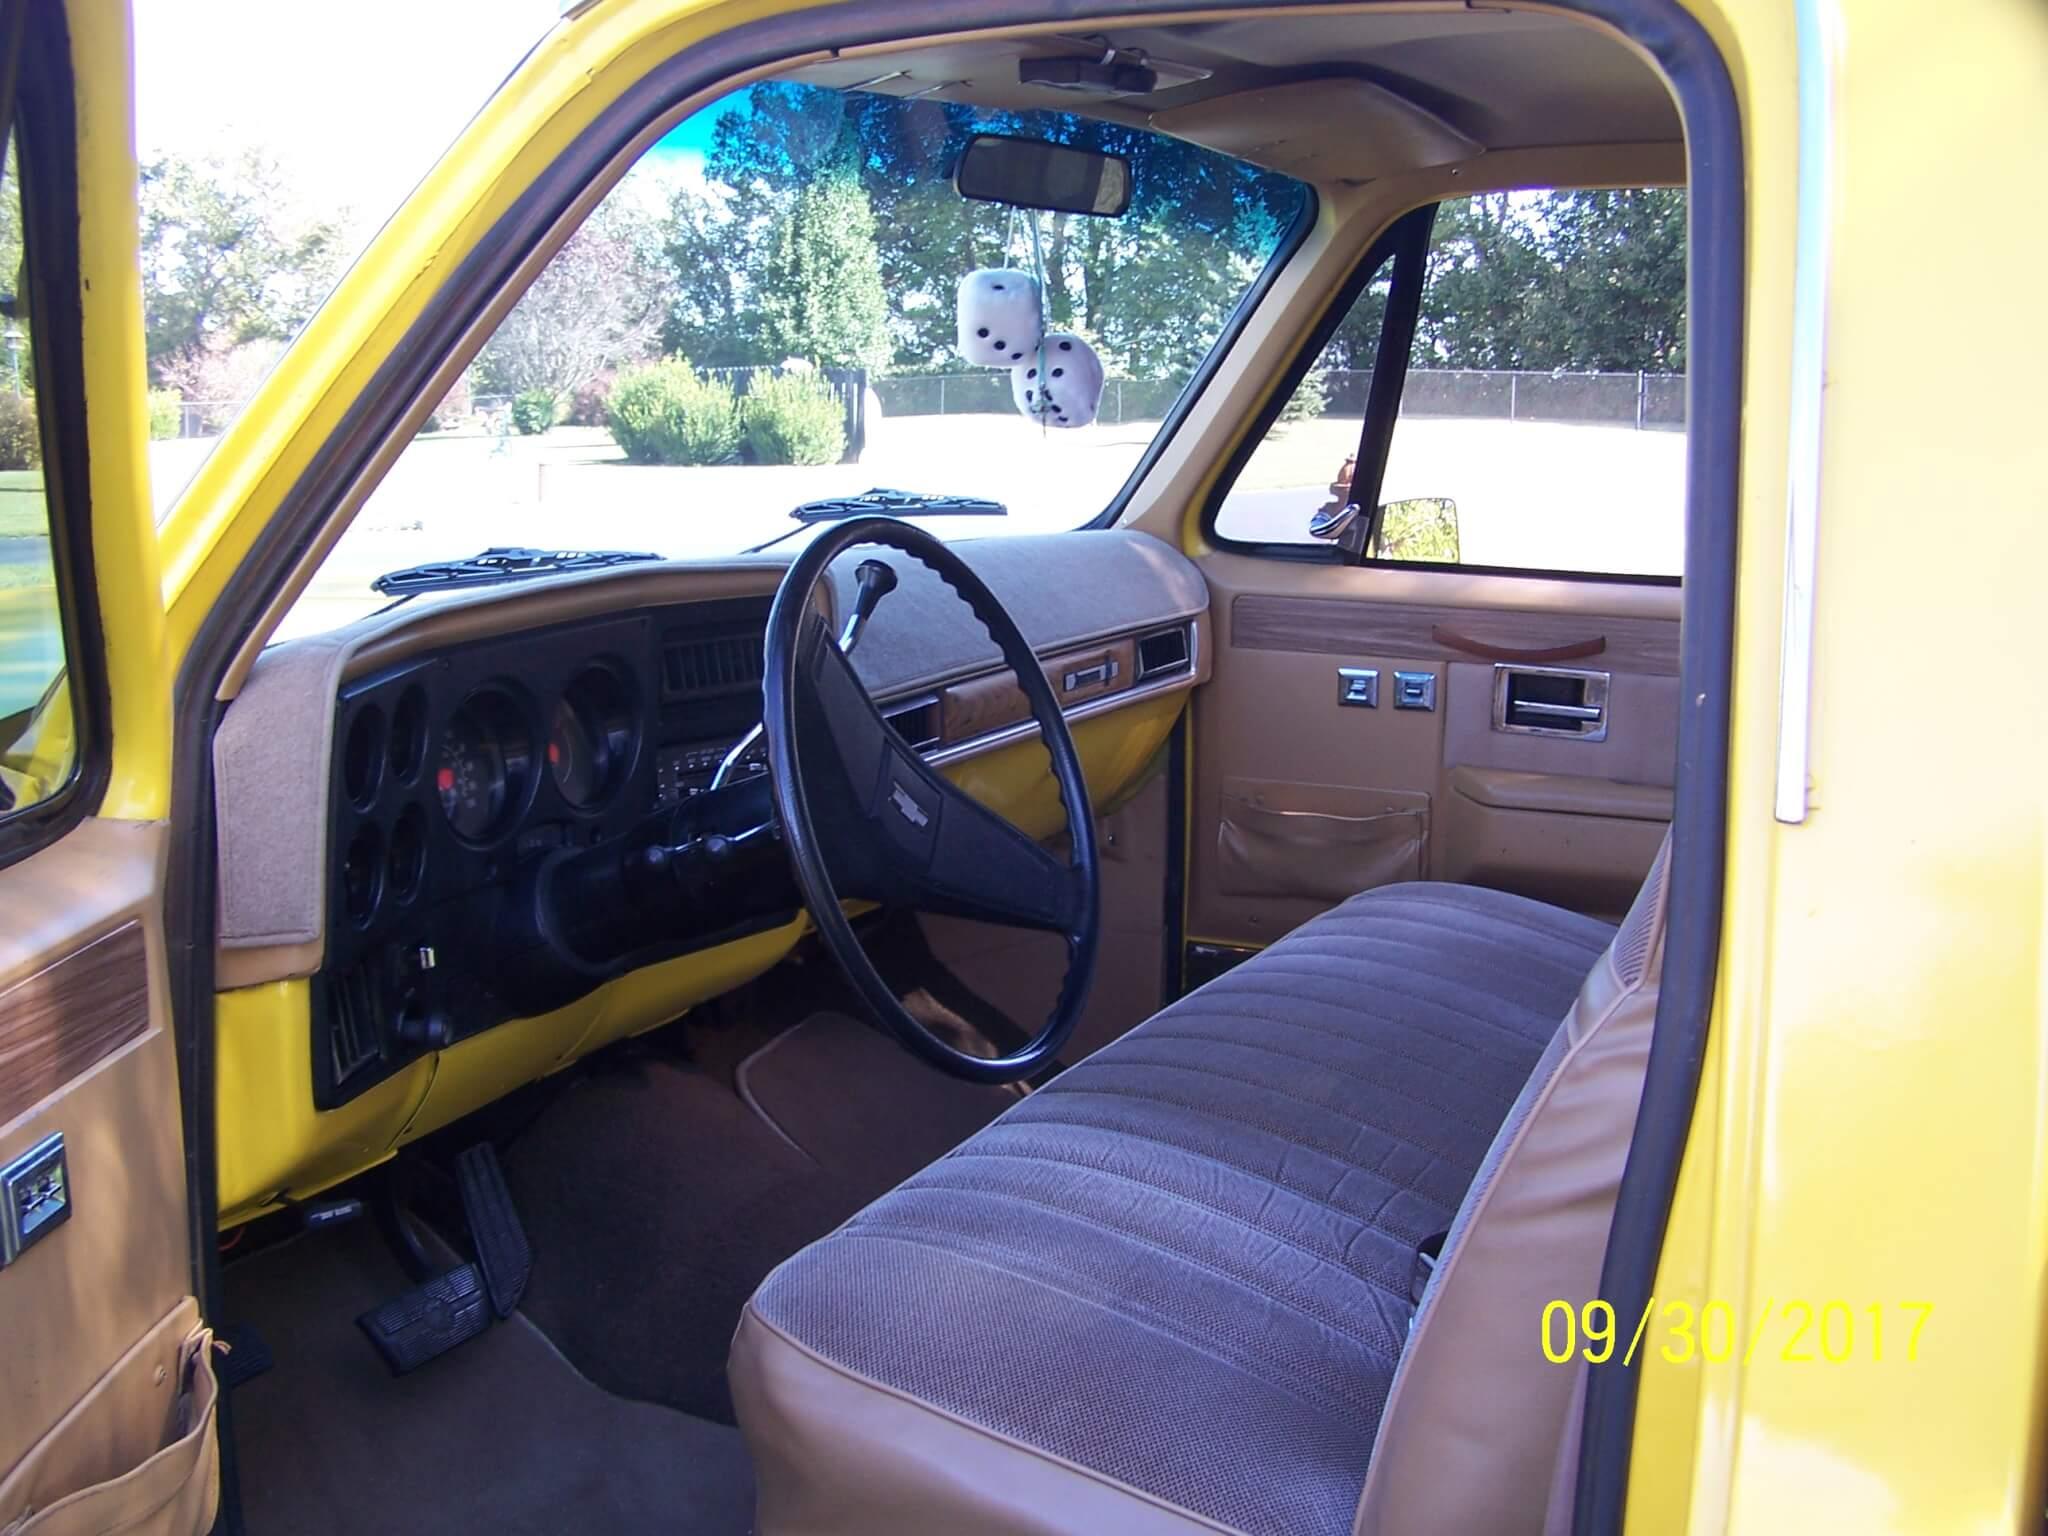 grows adventure chevrolet s truck panels interior chevy silverado highcountryinterior meet wings door